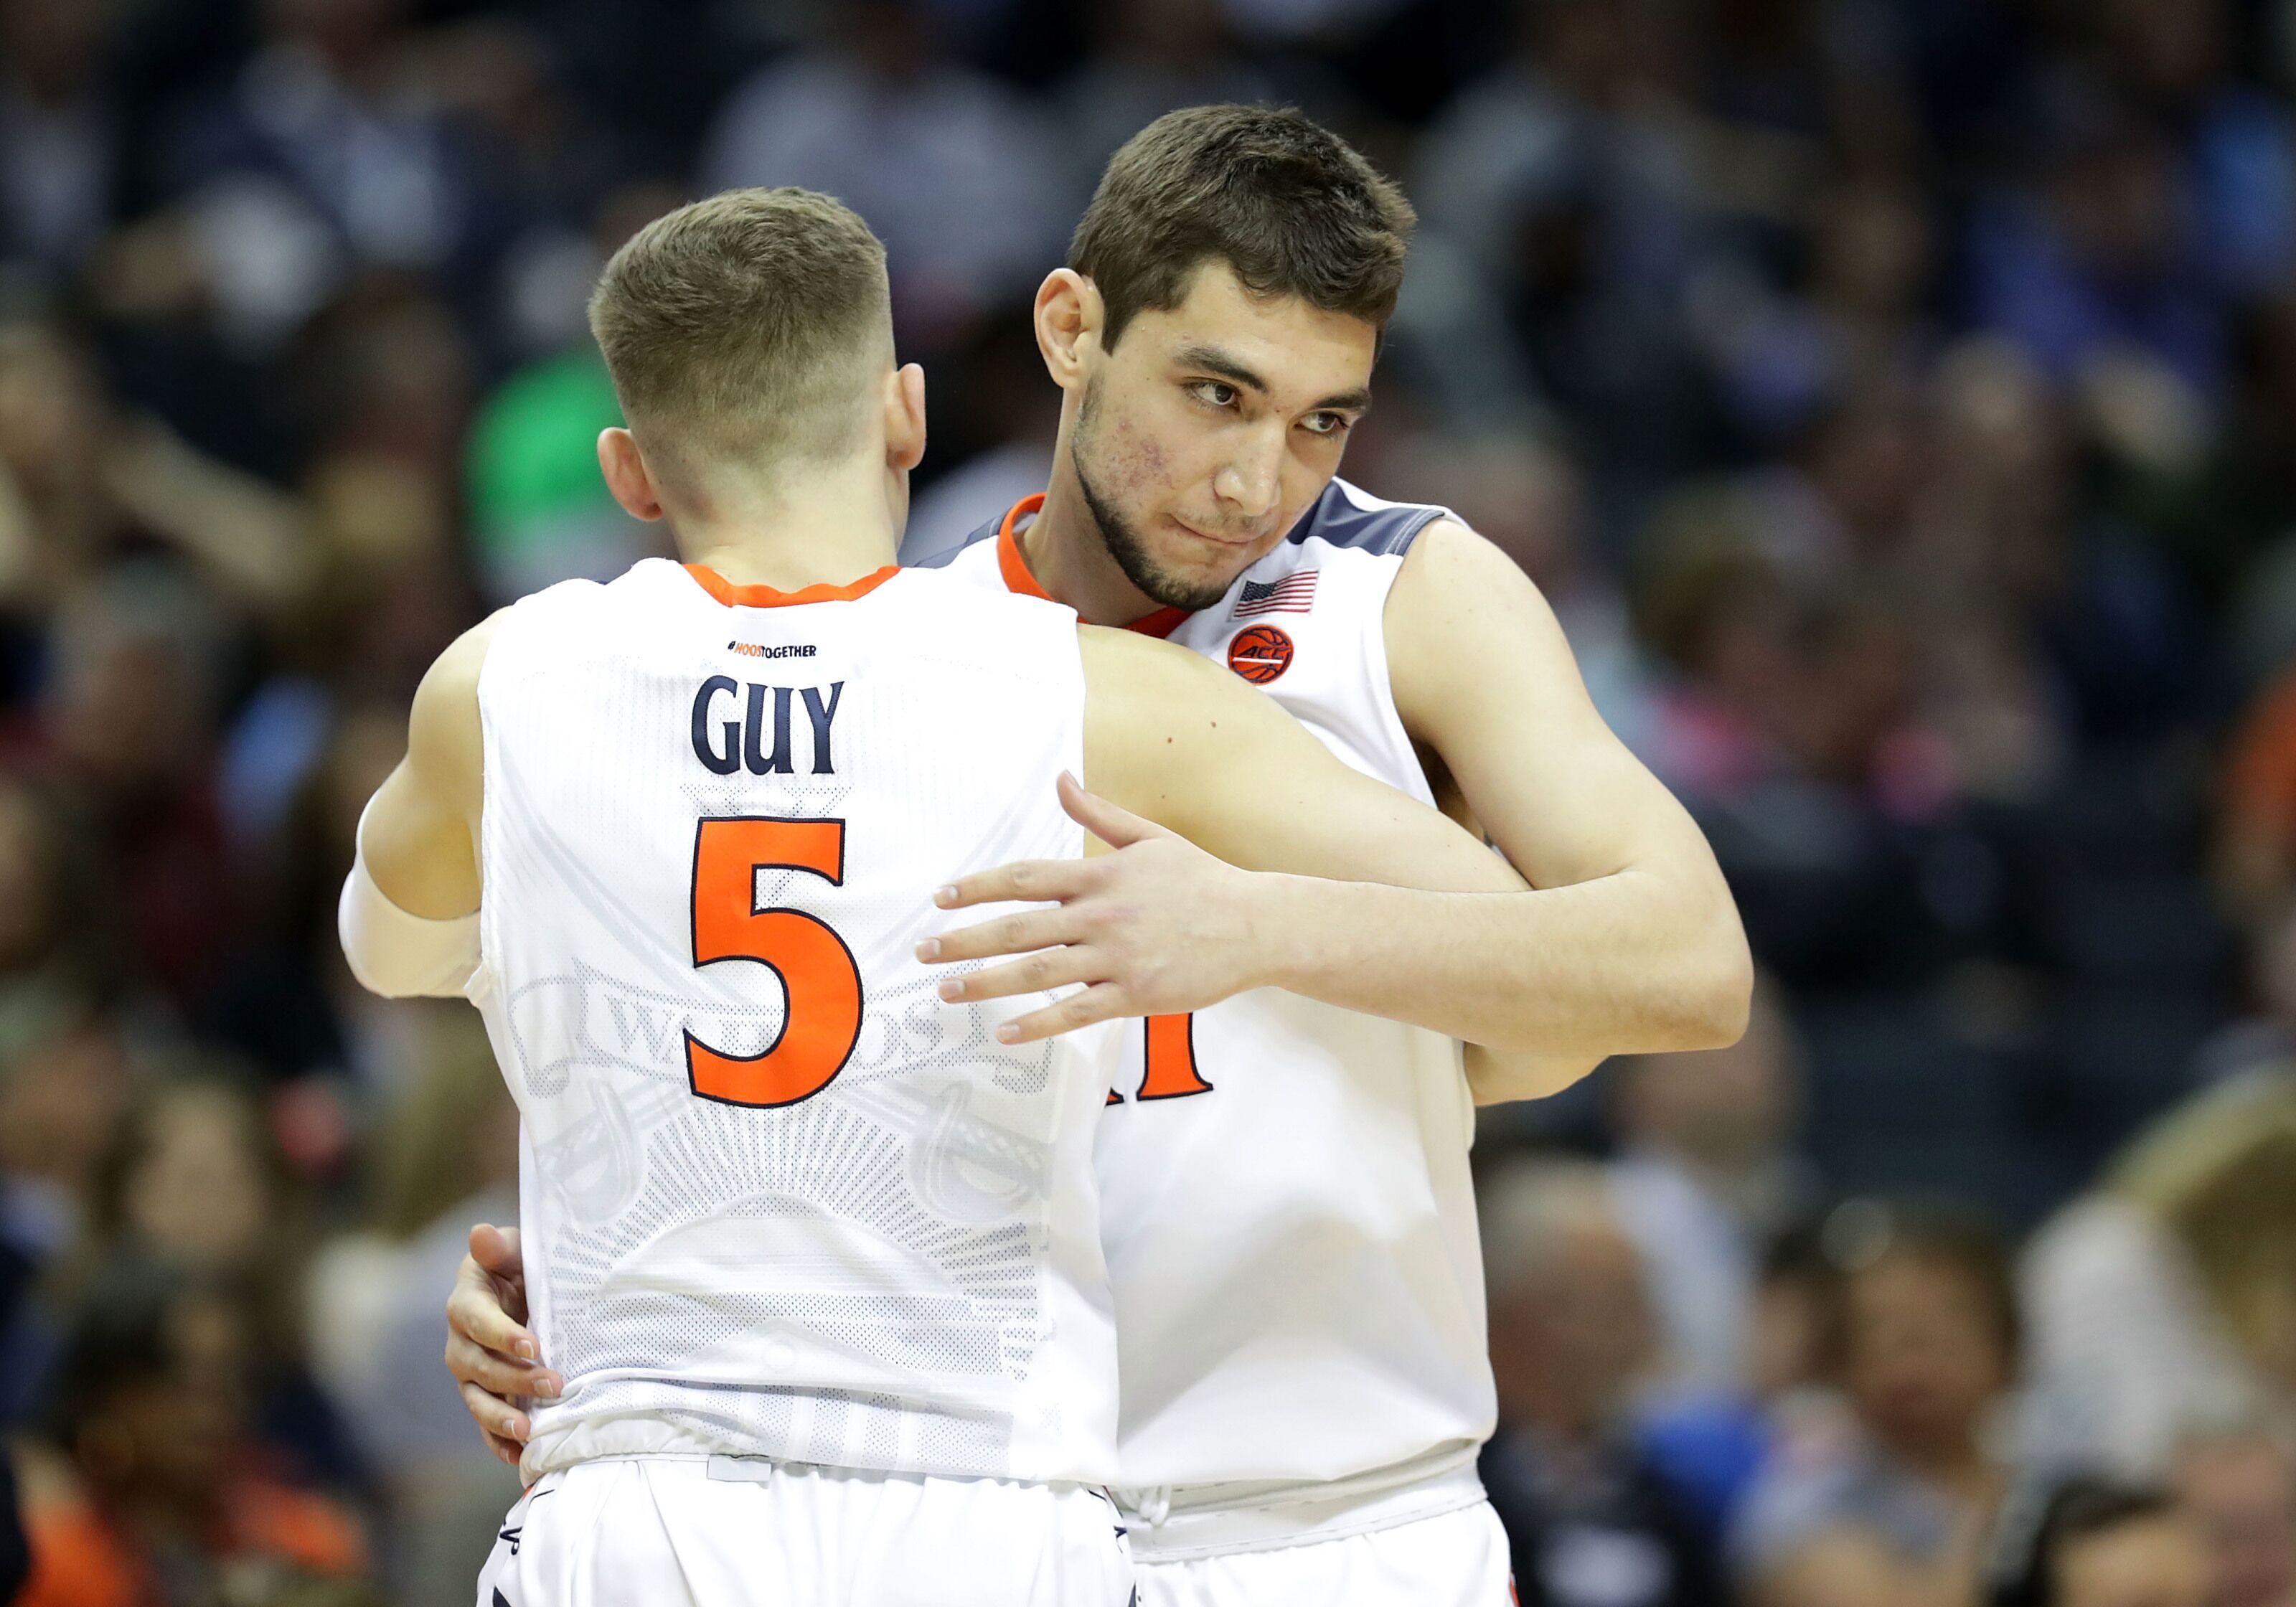 Virginia Basketball: Cavaliers complete season sweep of Virginia Tech